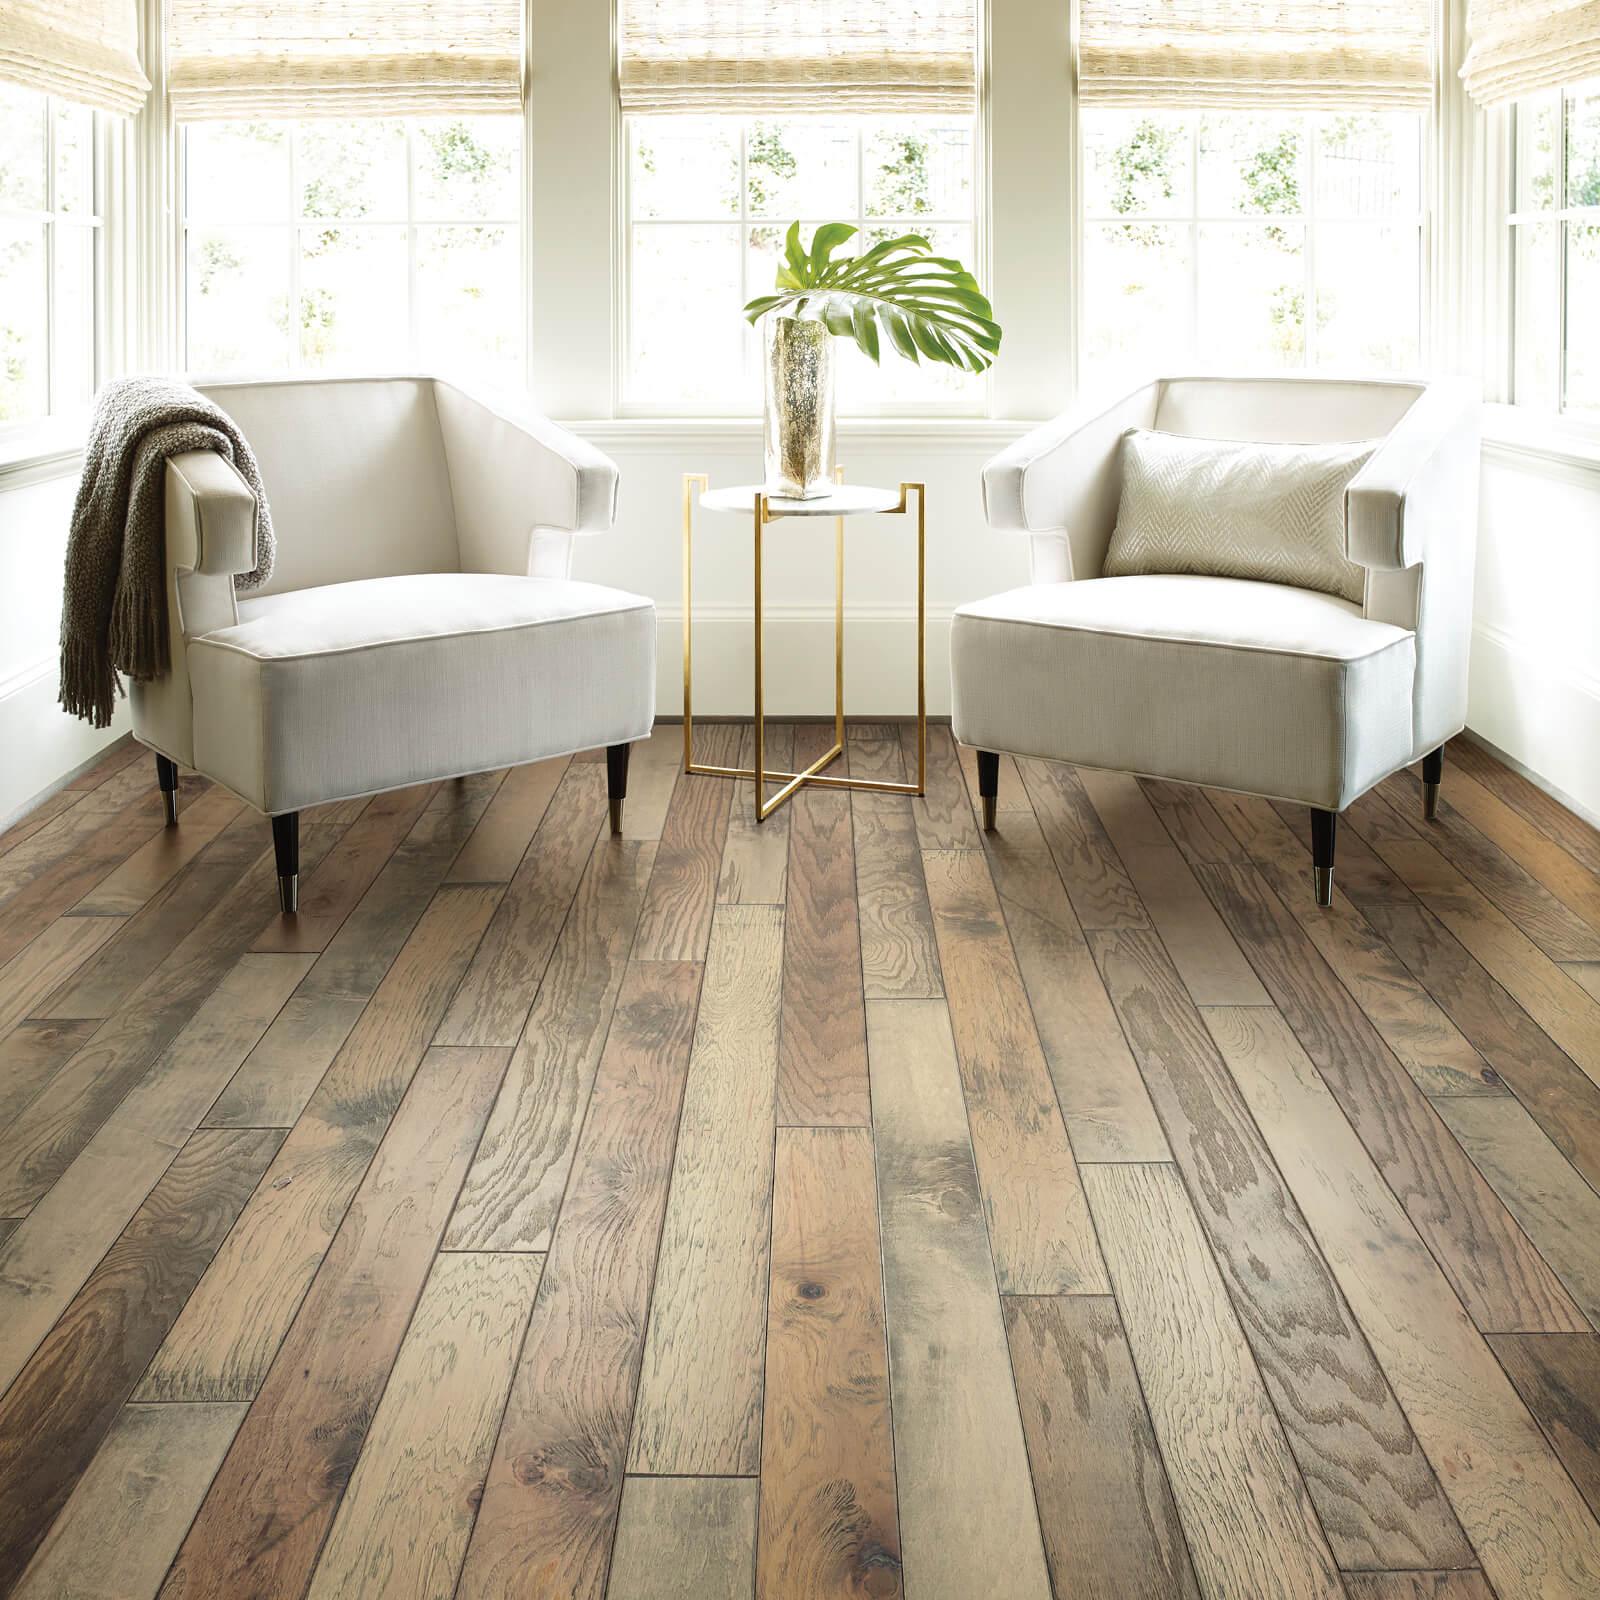 Hardwood floor | BMG Flooring & Tile Center